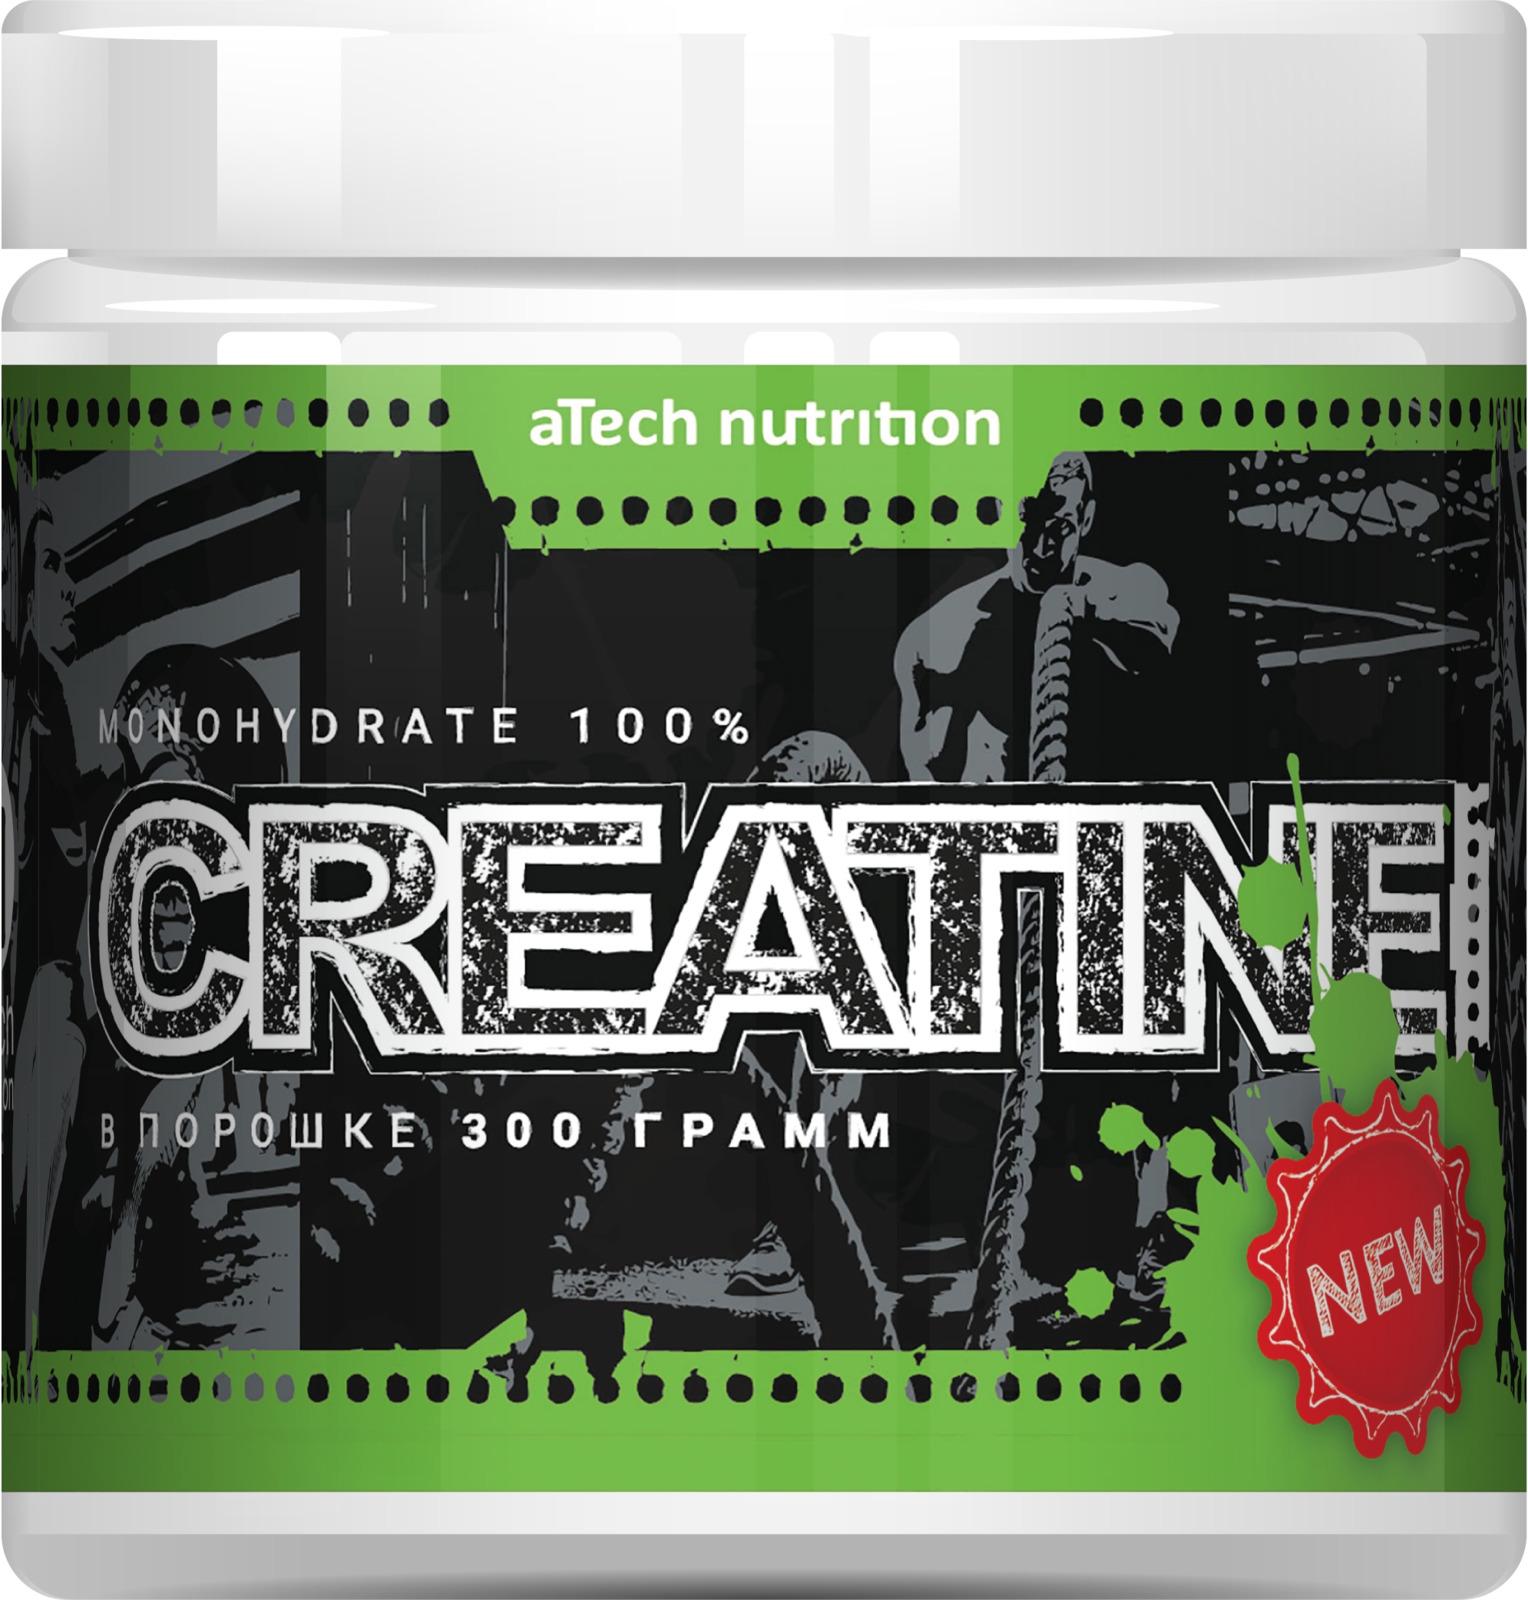 Креатин aTech Nutrition Creatine Monohydrate 100%, 300 г стоимость